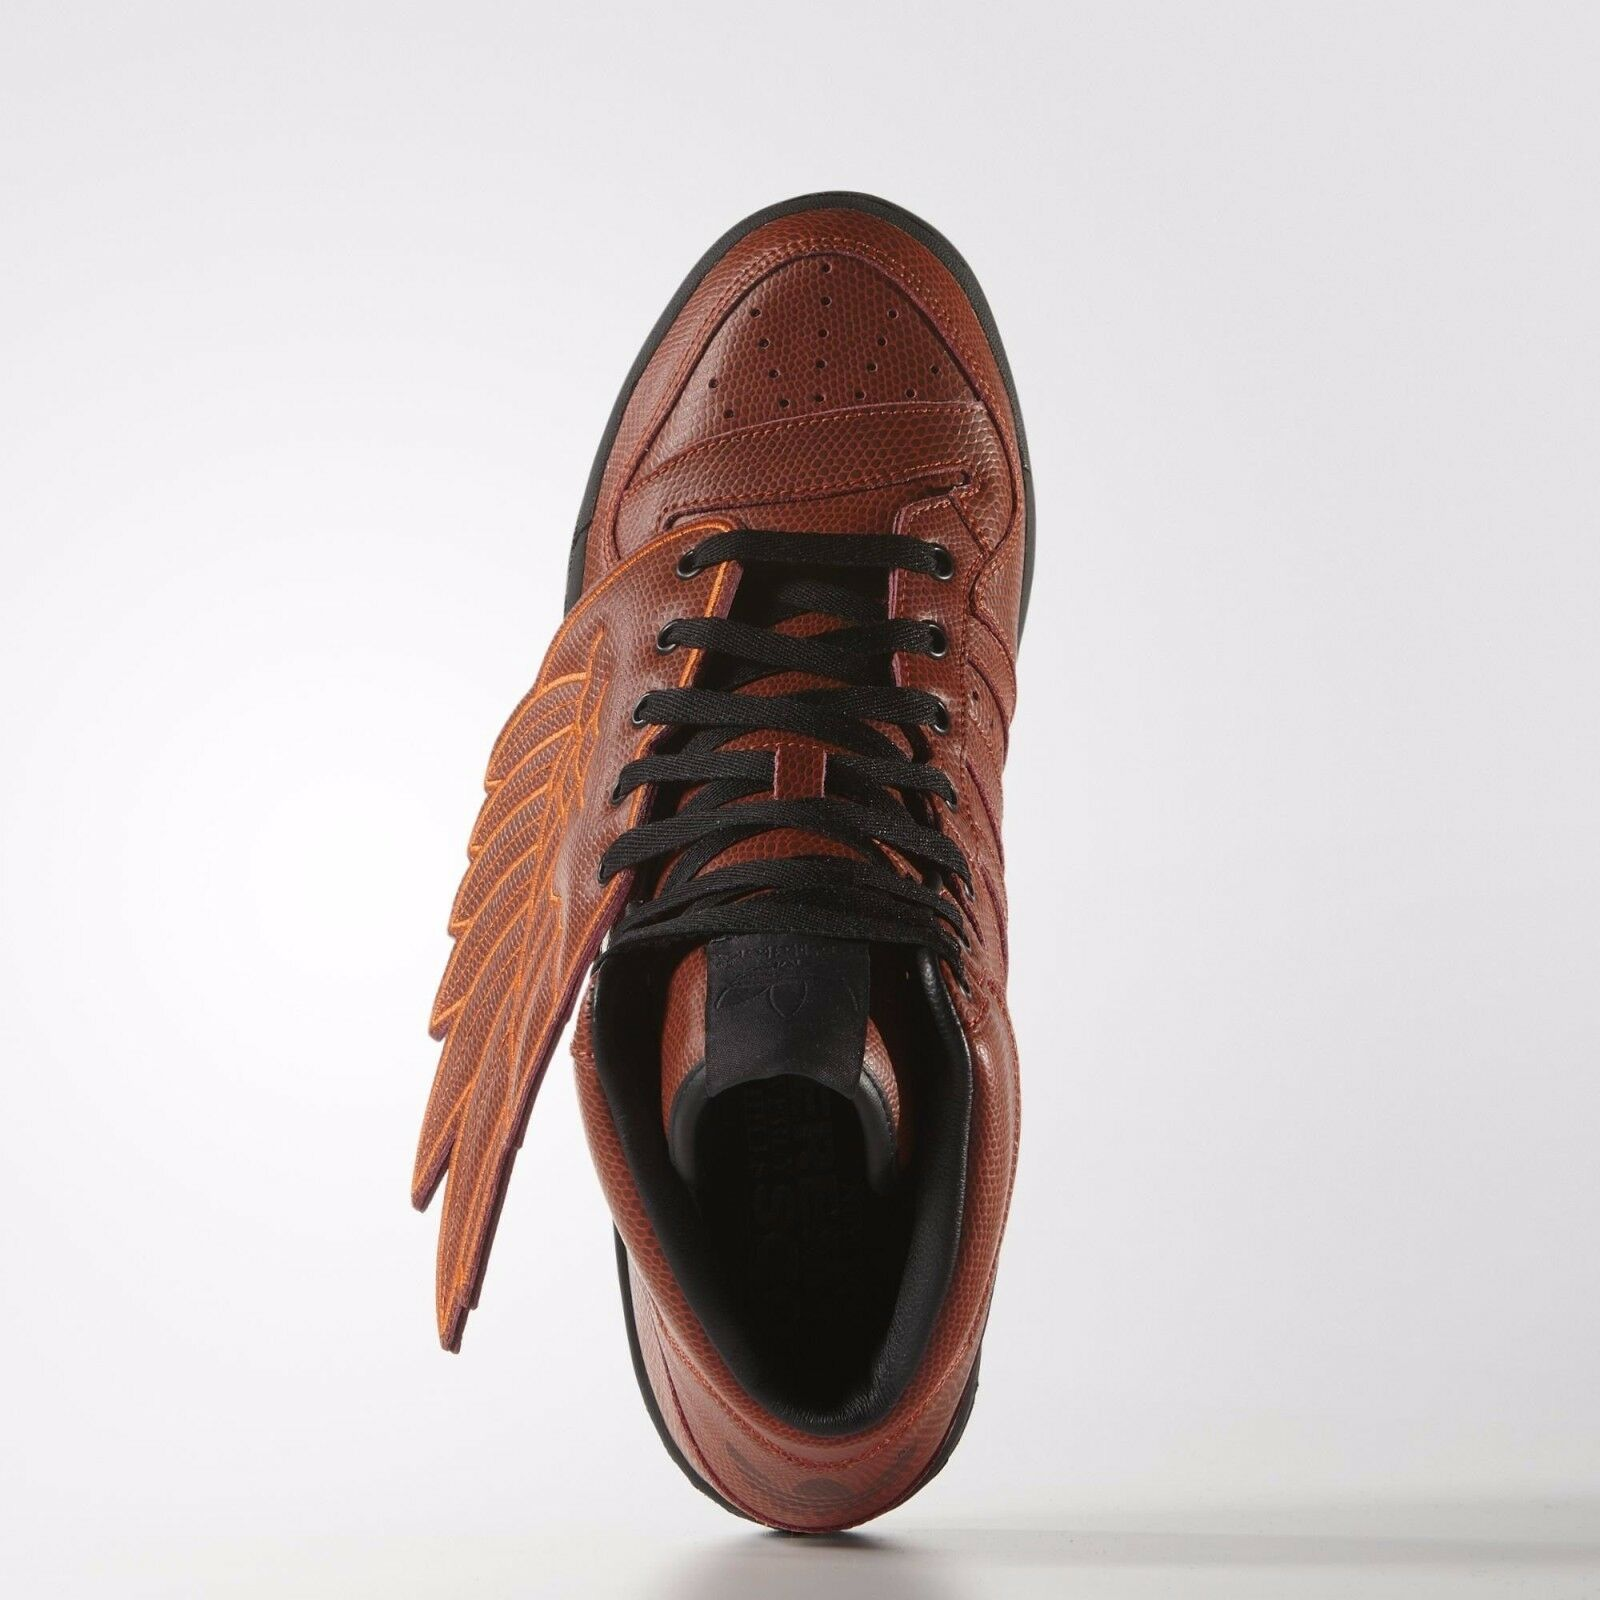 Adidas originals jeremy wings scott js wings jeremy bball - männer - schuhe größe 5 rote s77803 81bb6e